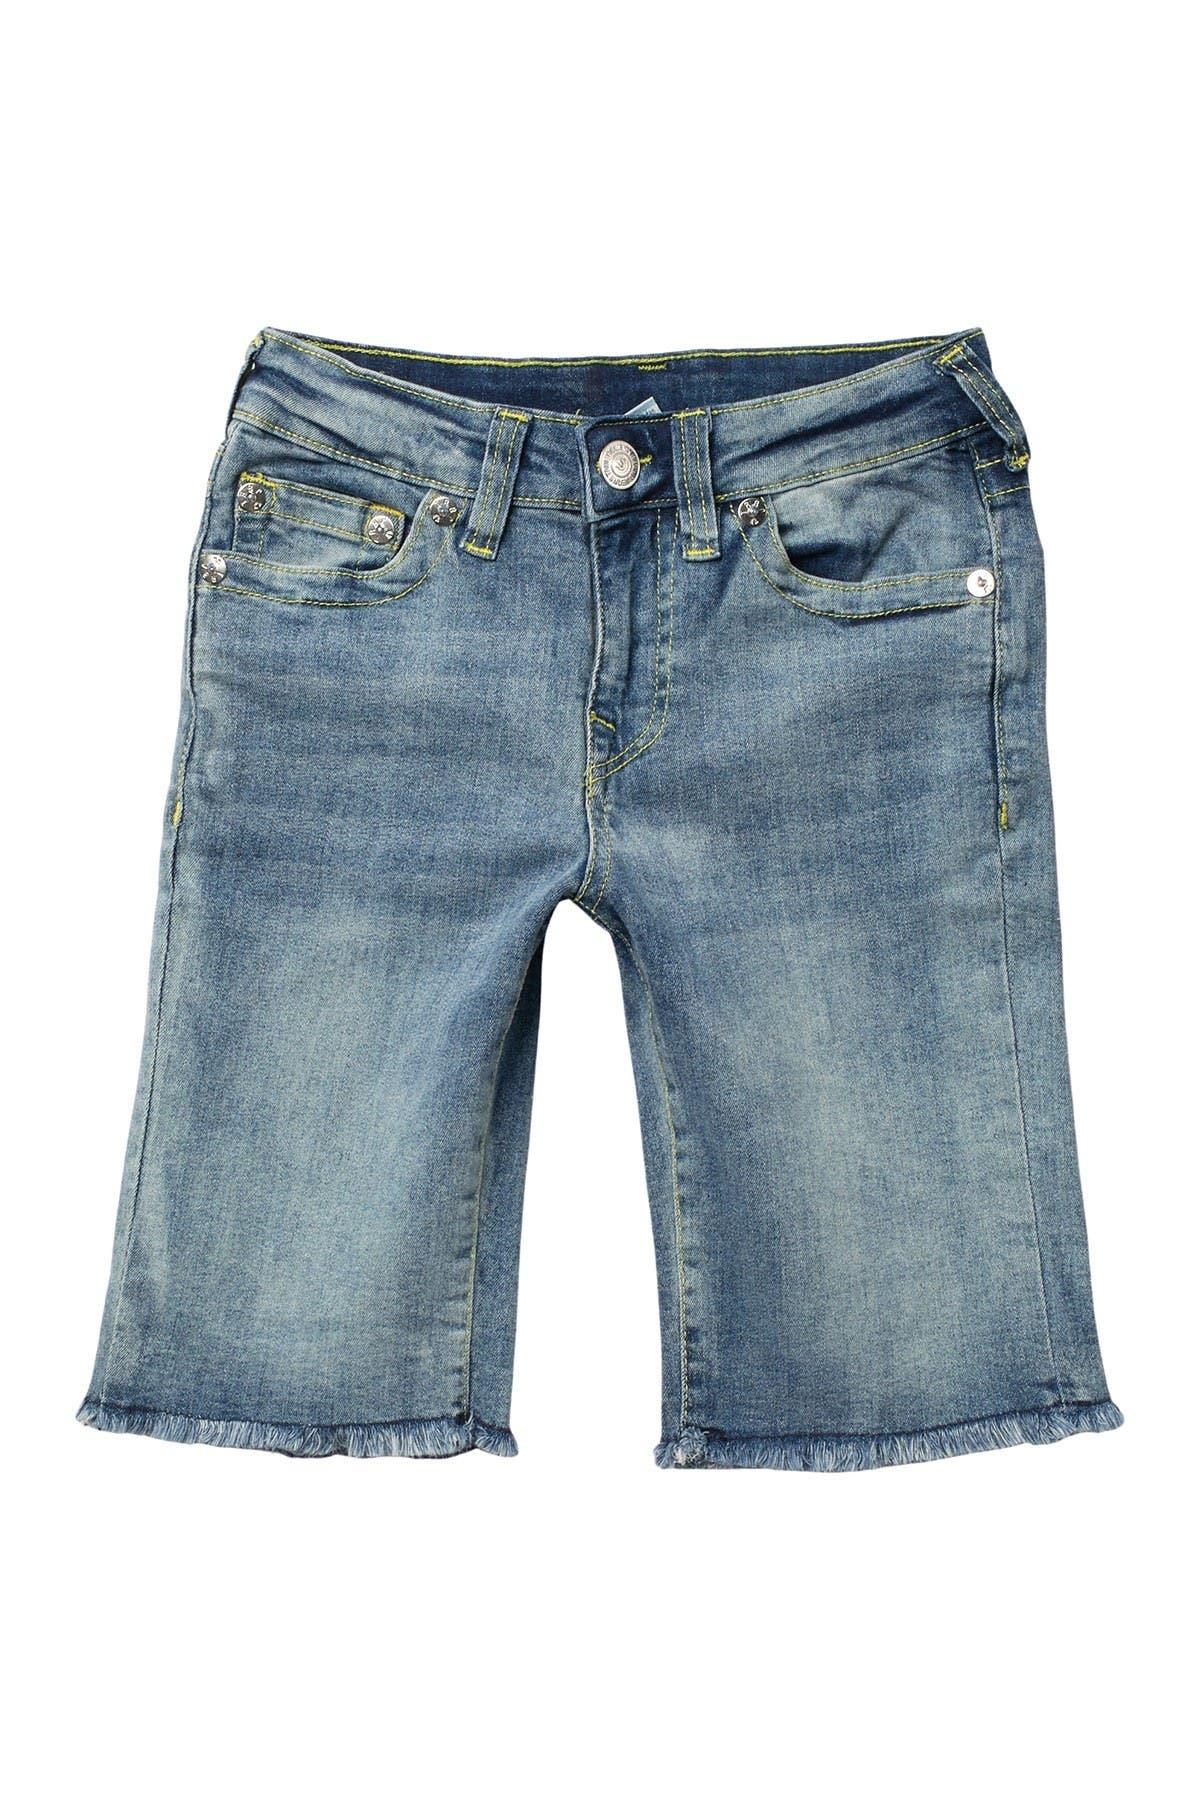 Image of True Religion Geno SE Frayed Shorts